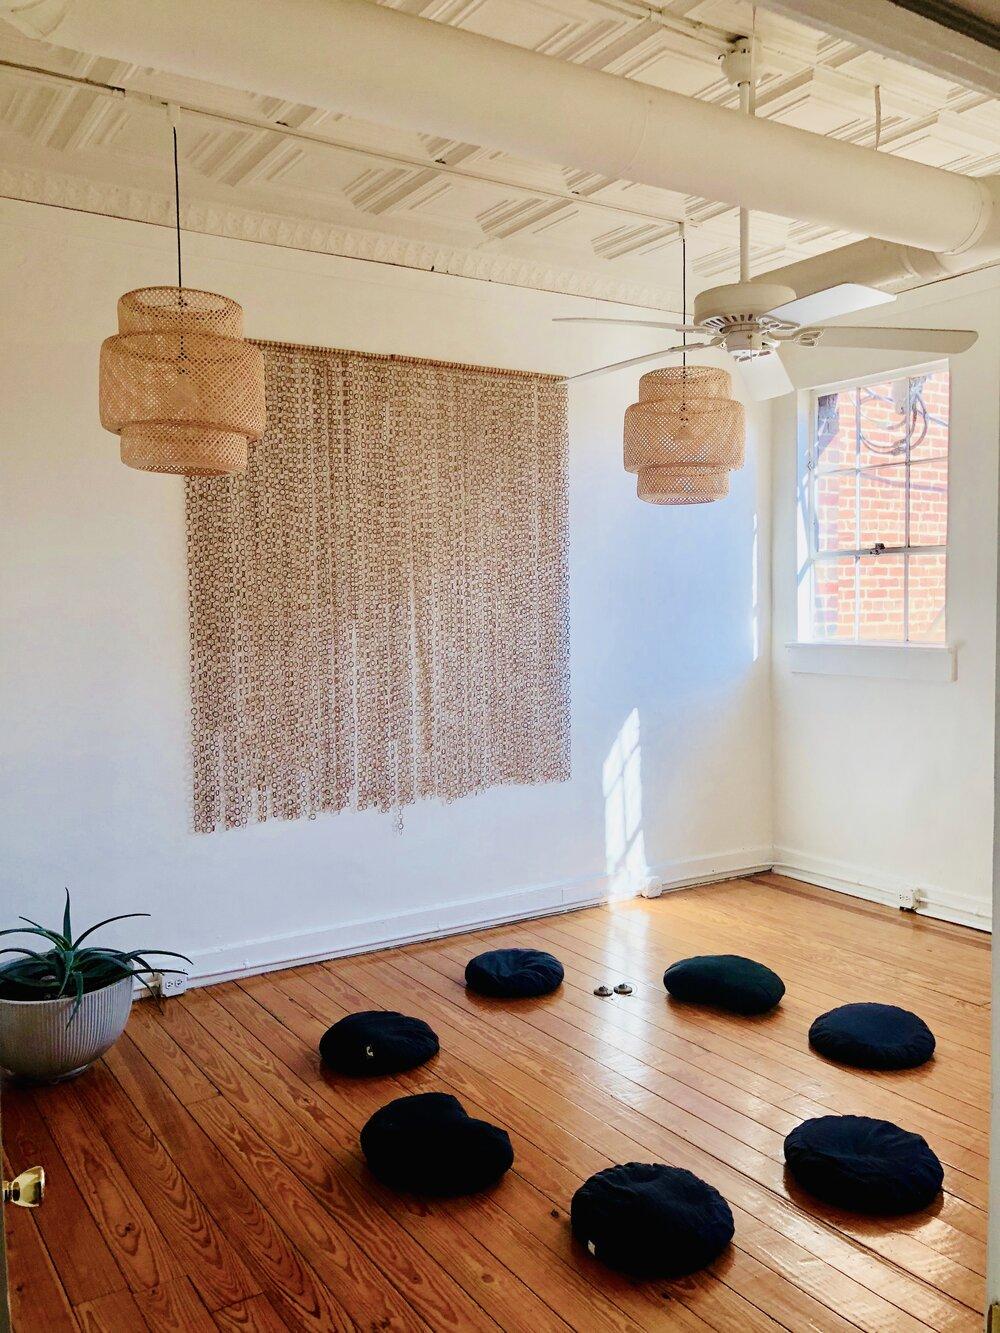 "Jan 1<br/><a href=""http://www.ashtangayogarichmond.com/workshops-and-events/"">New Year's Day Restorative Yoga & Meditation</a>"